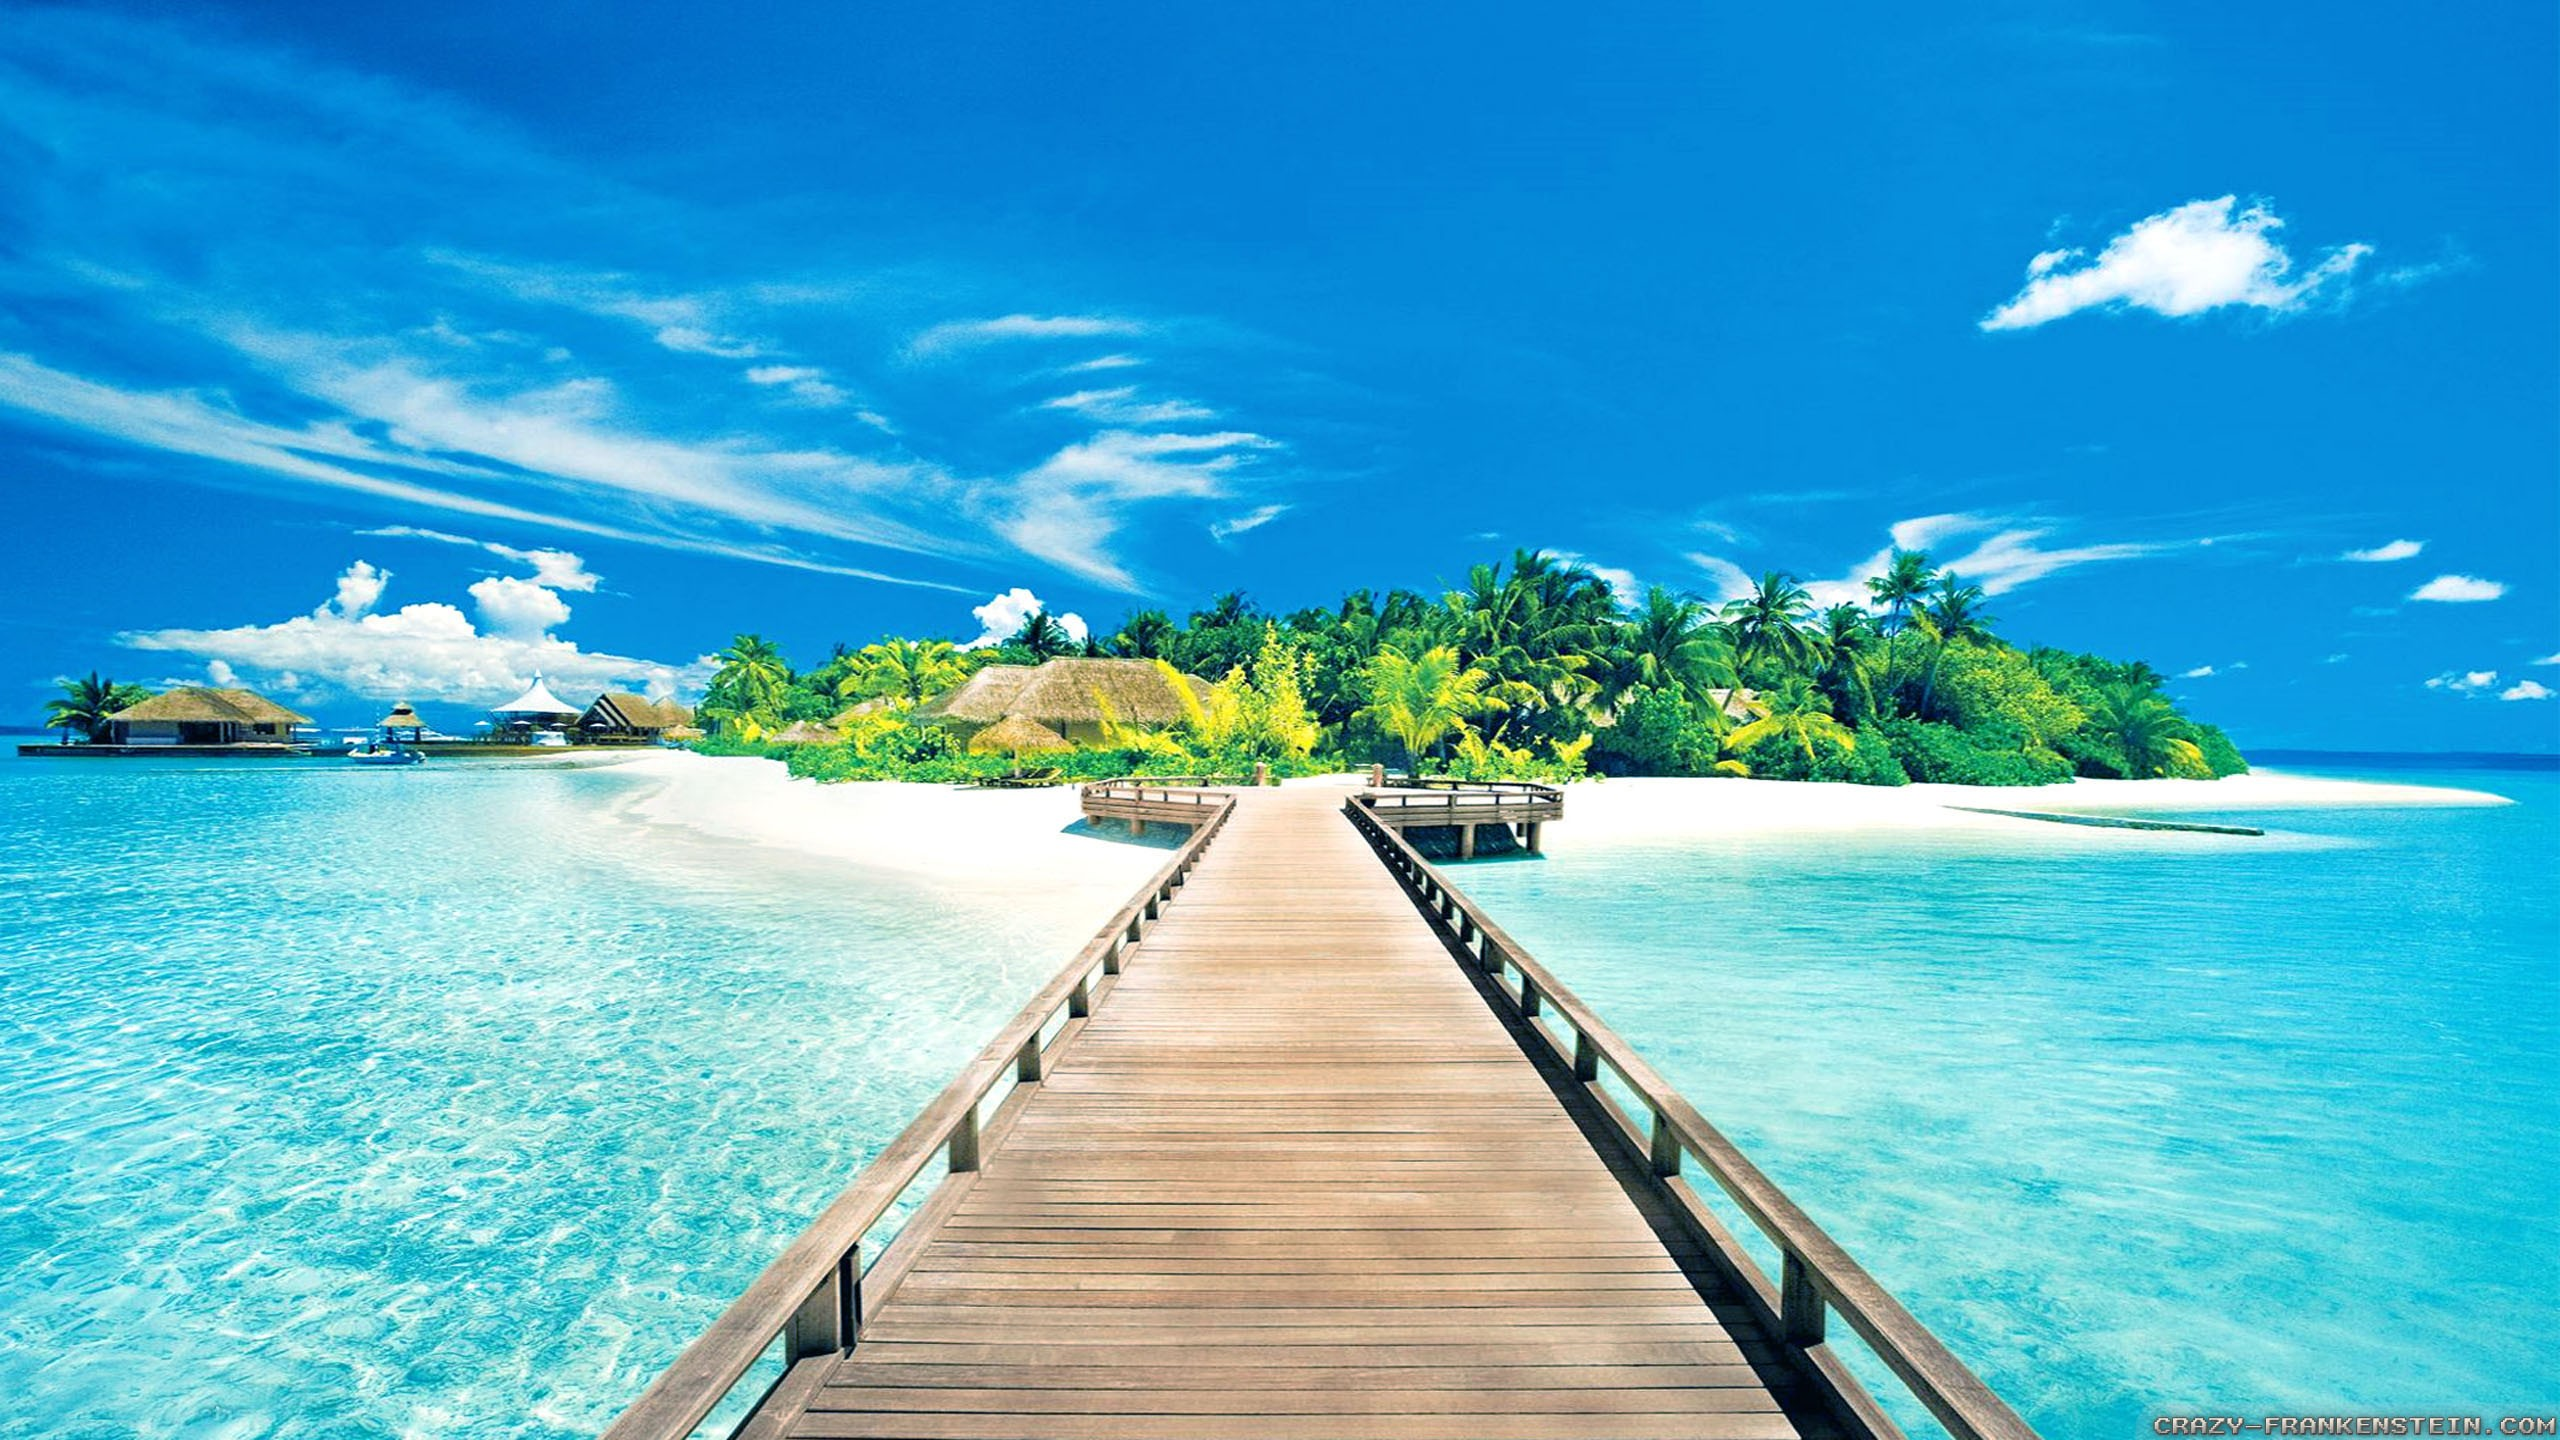 Summer Wallpaper HD Full HD Download High Definiton 2560x1440